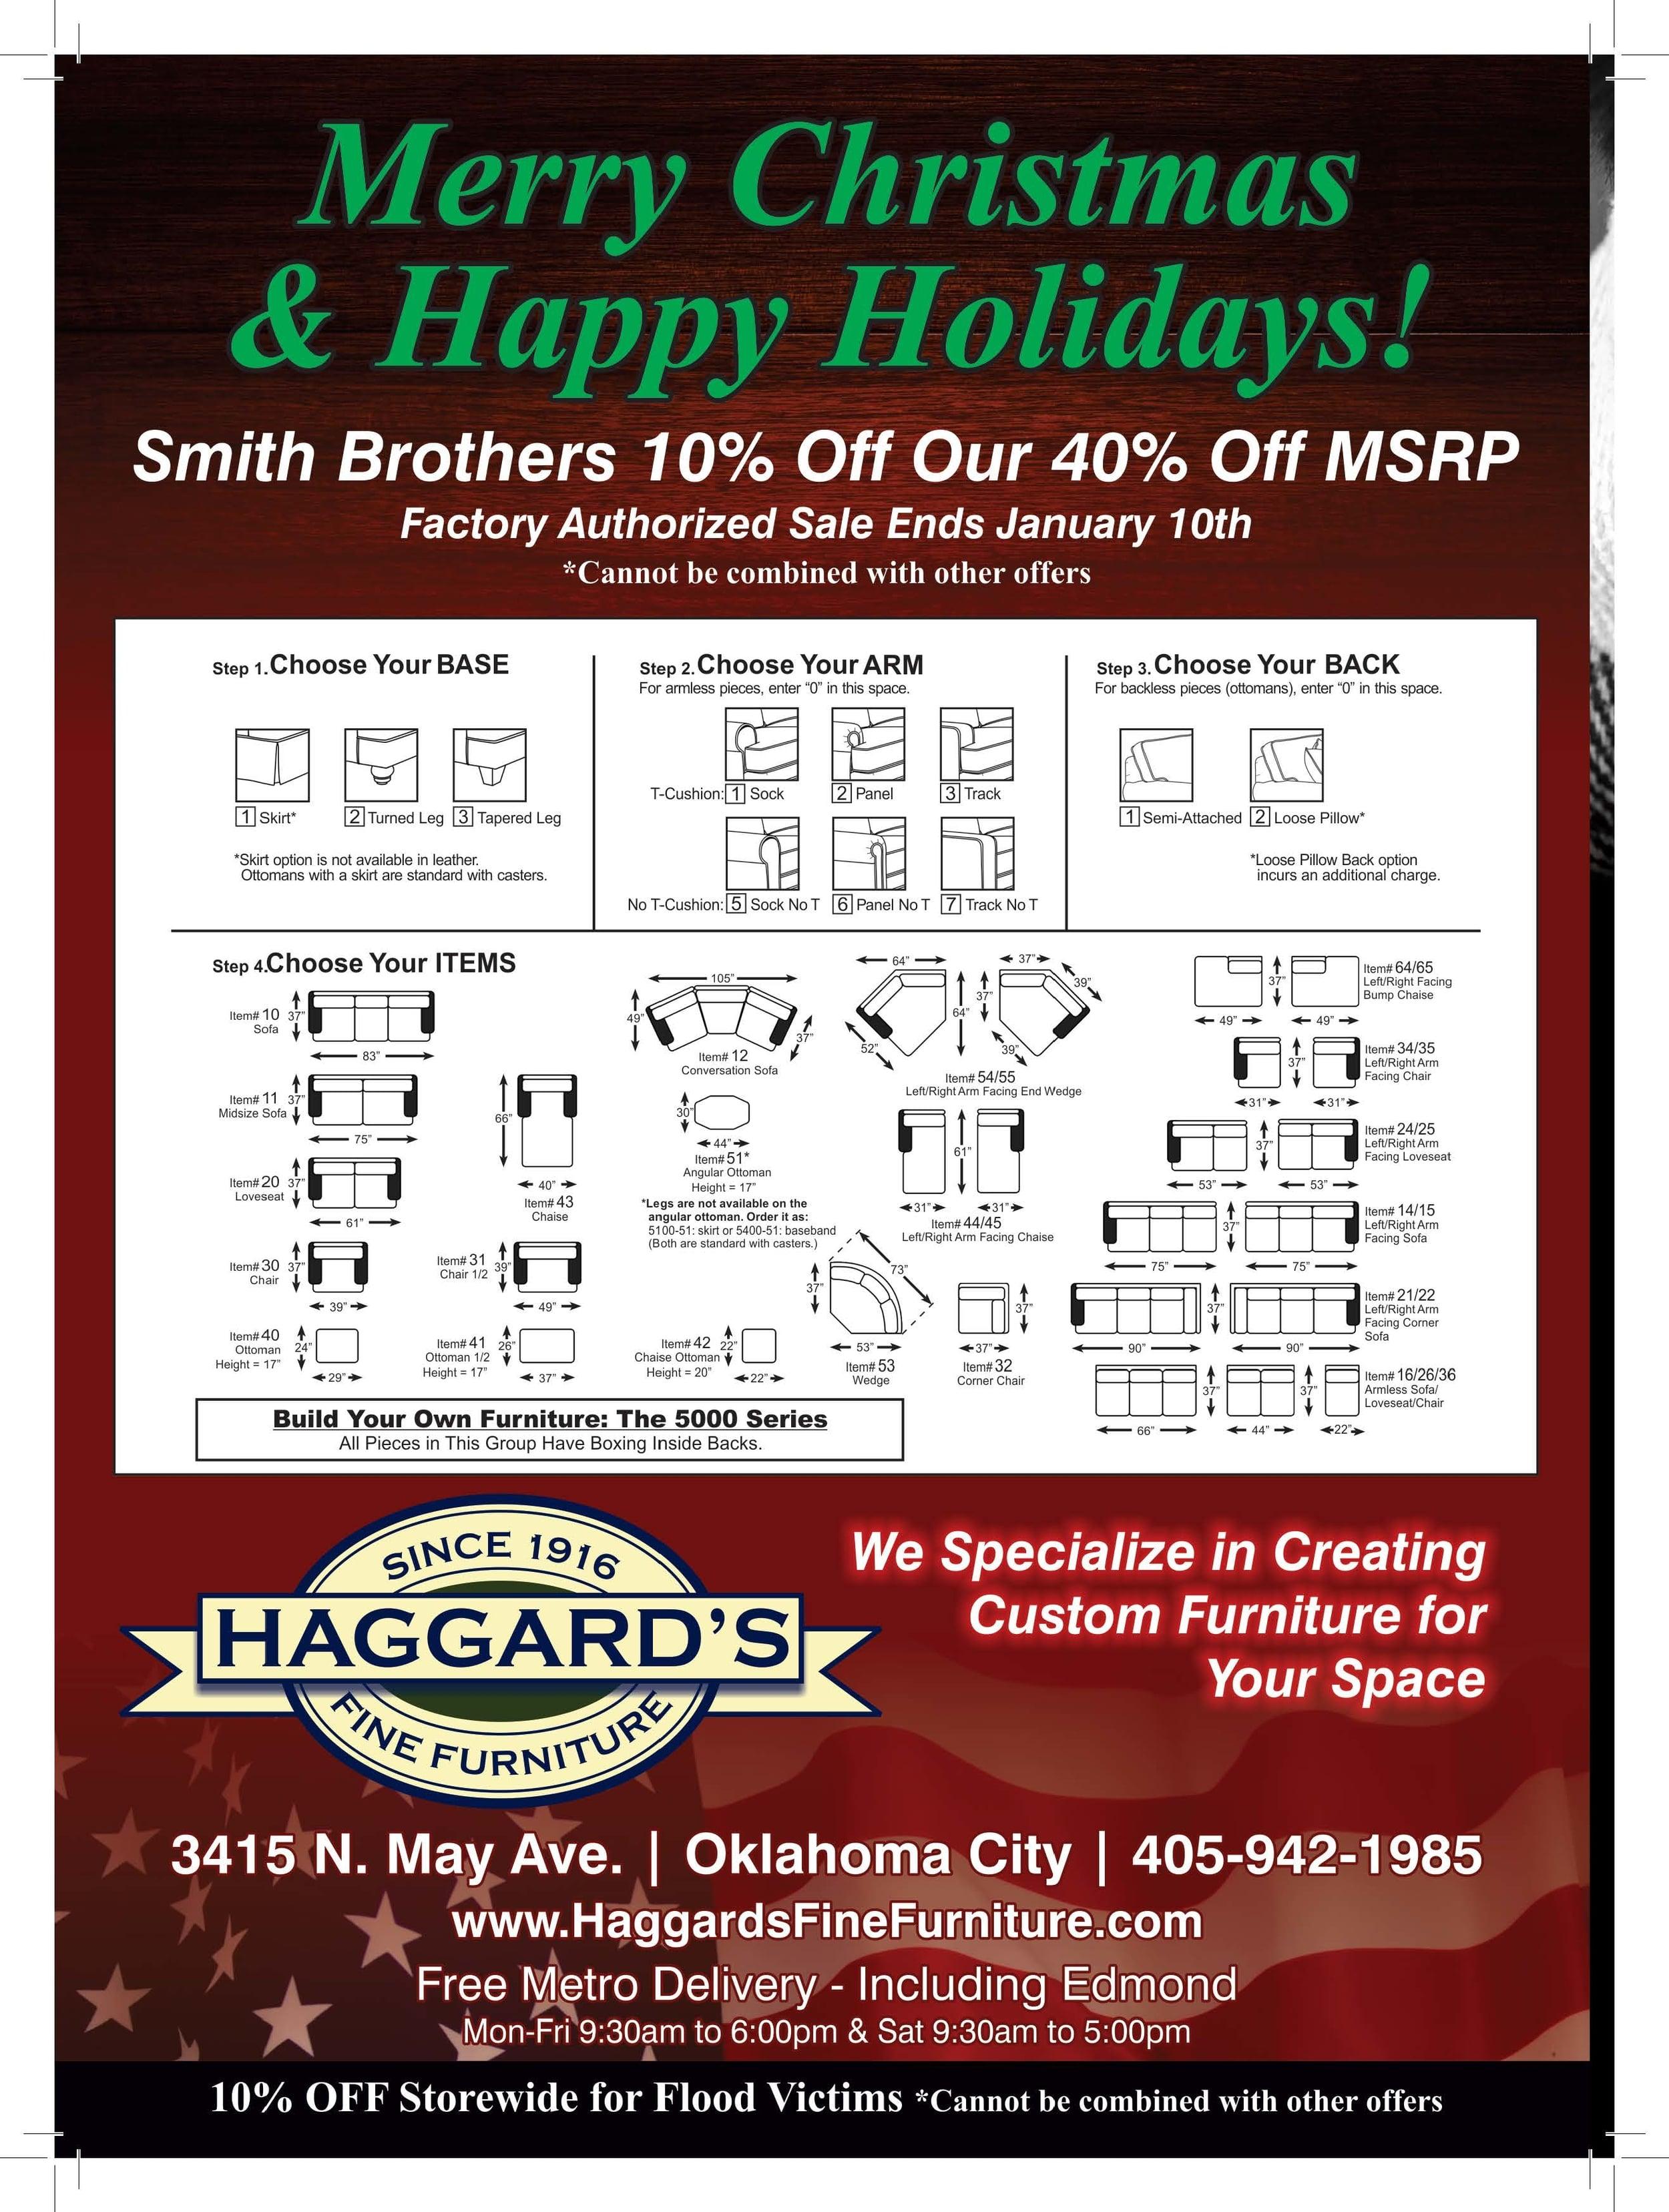 ChoctawHarrah December FINAL_Page_02.jpg